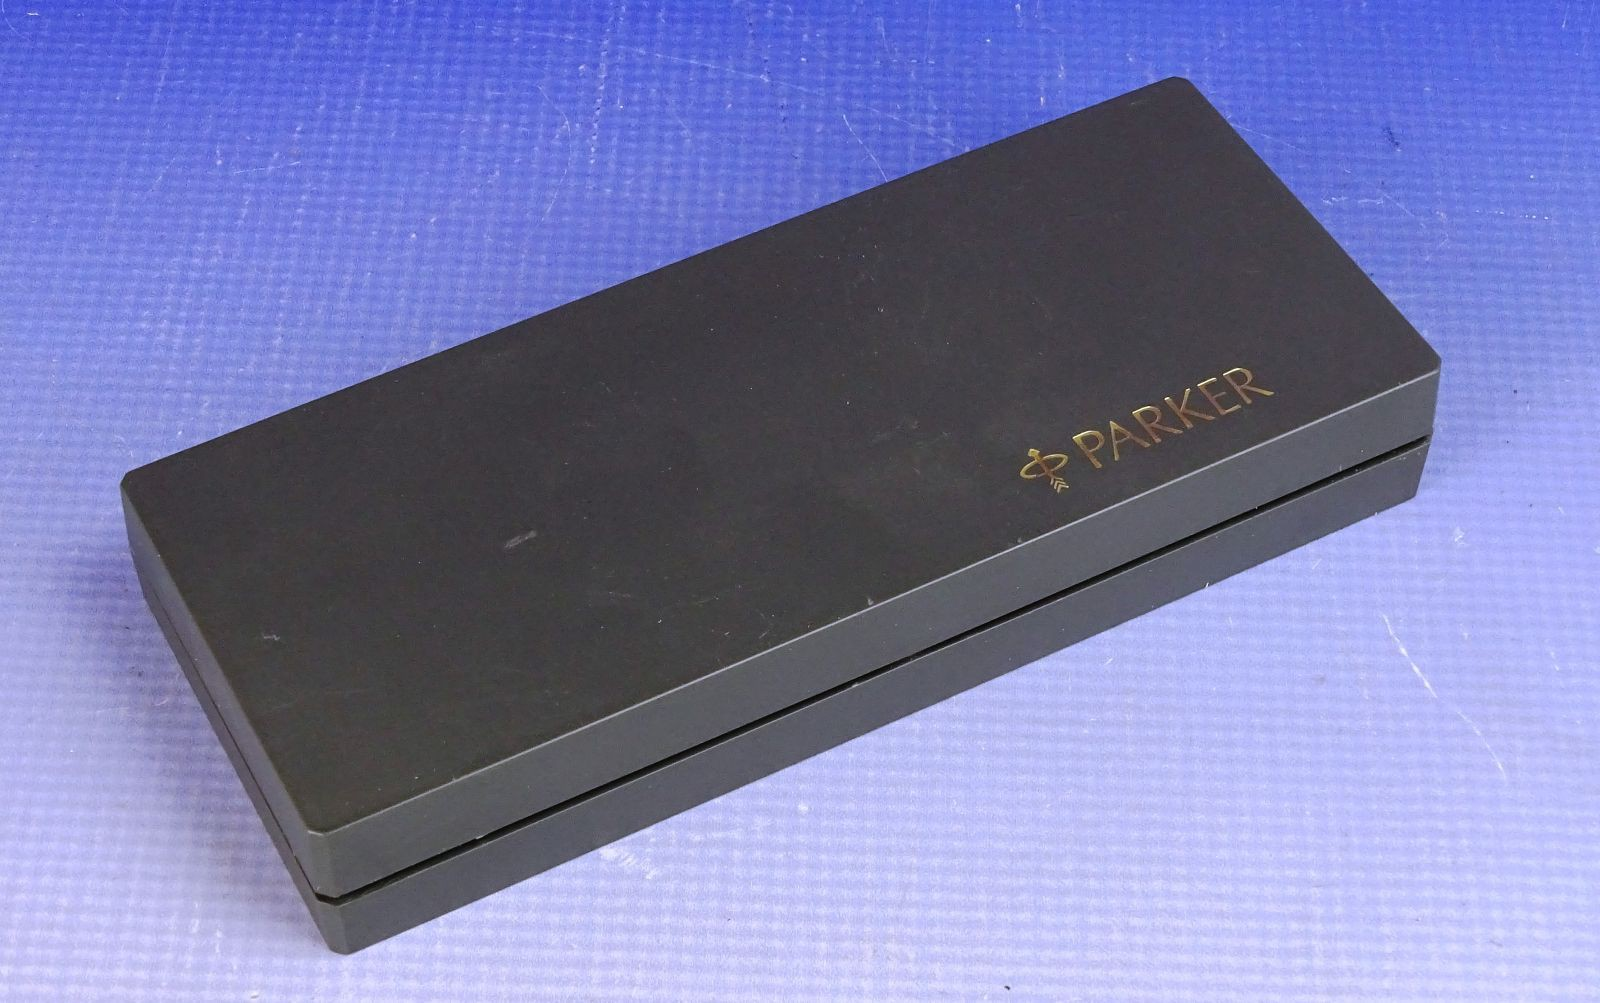 DSC02264.JPG (1600�1003)